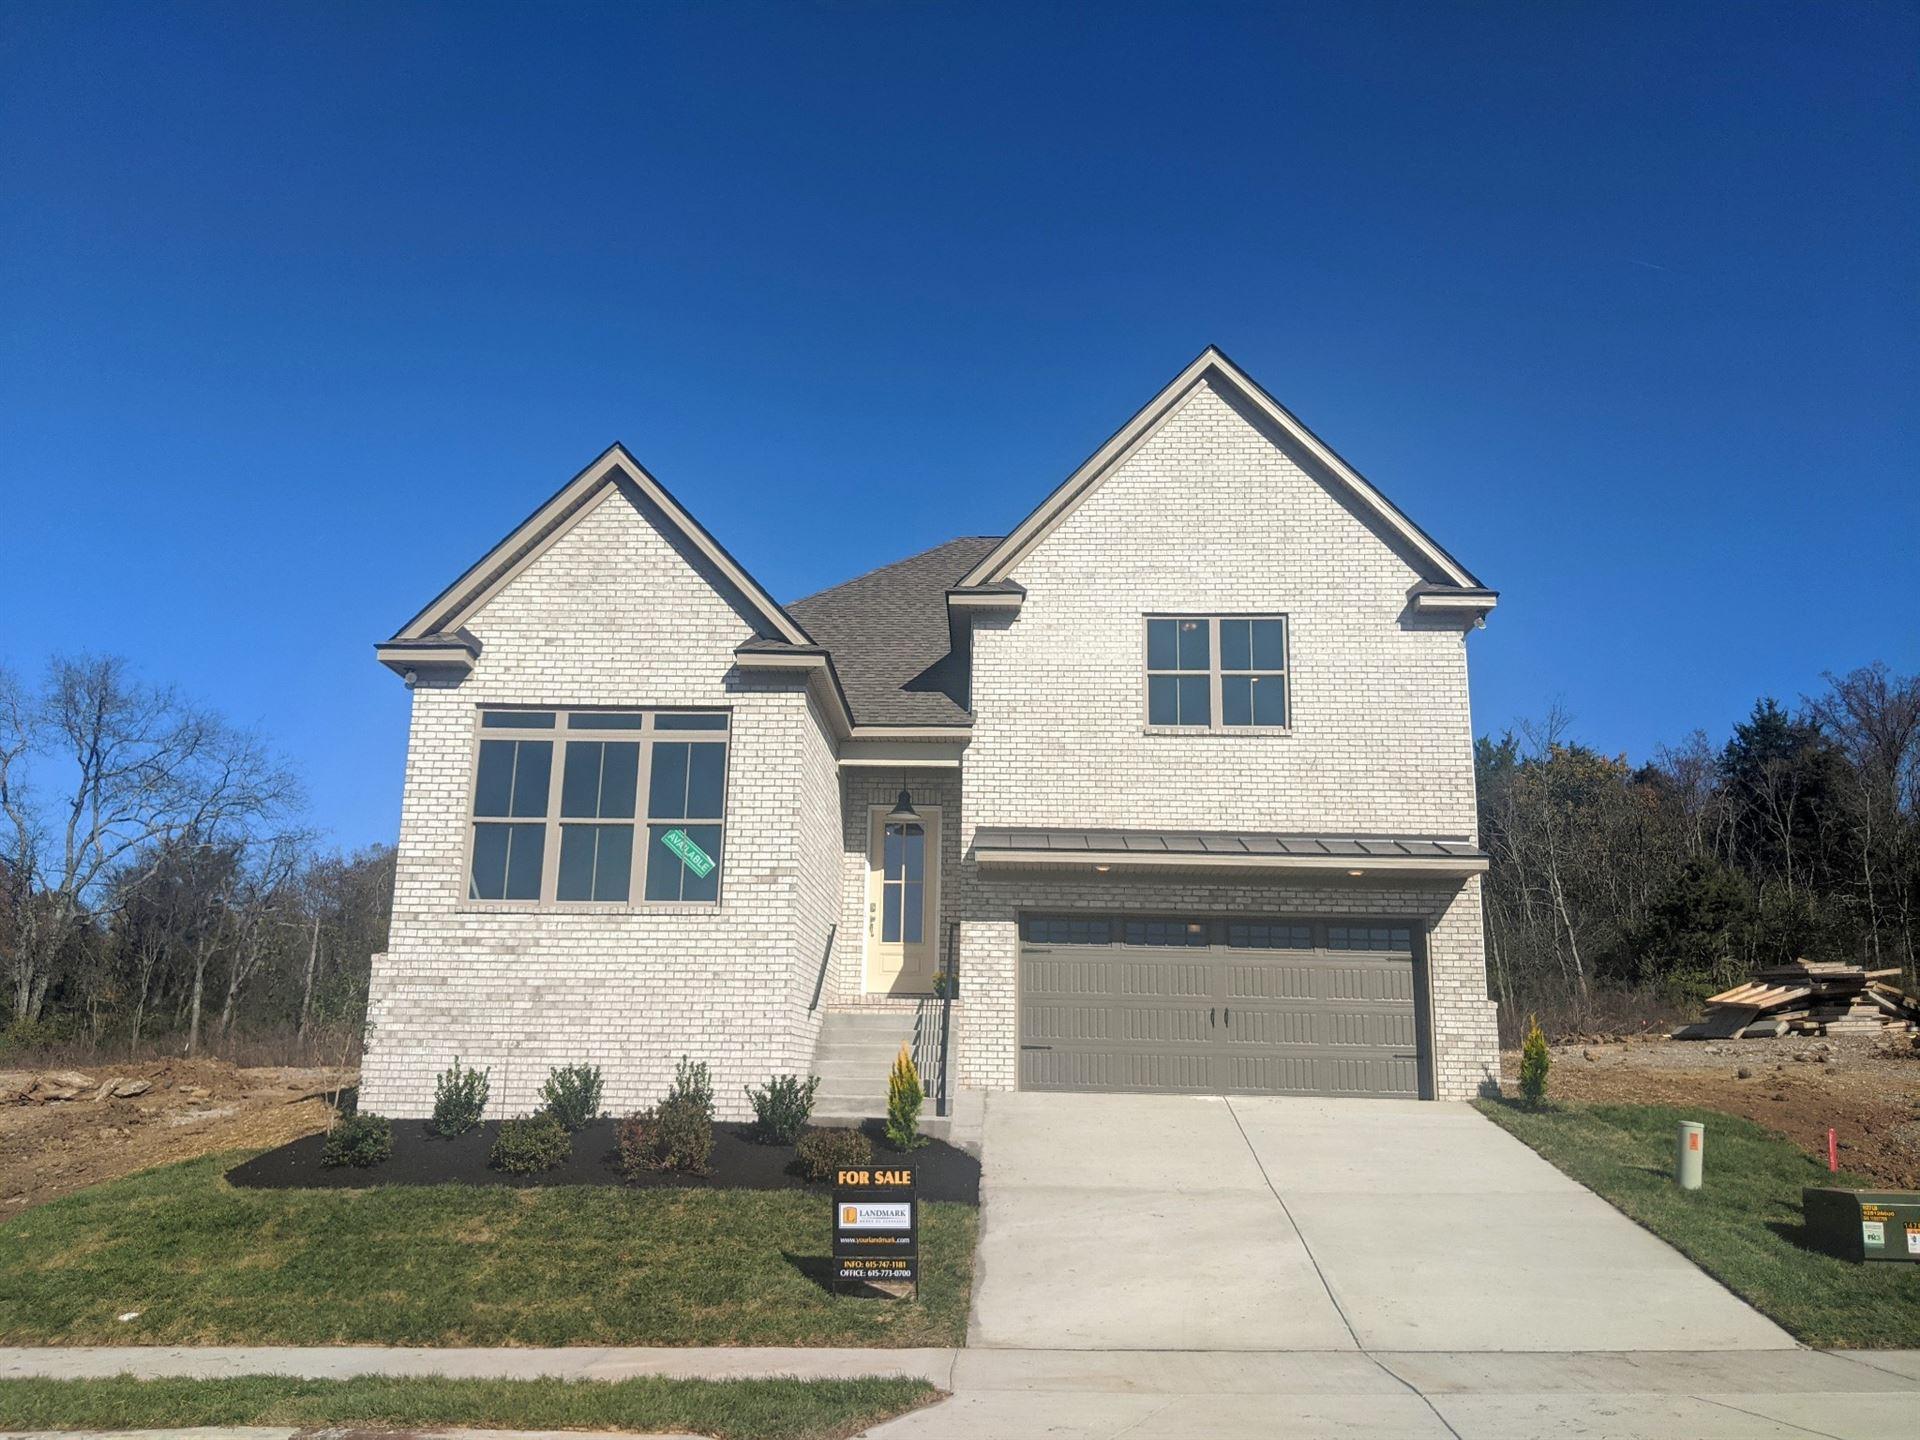 117 Lenham Drive, Brentwood, TN 37027 - MLS#: 2192759